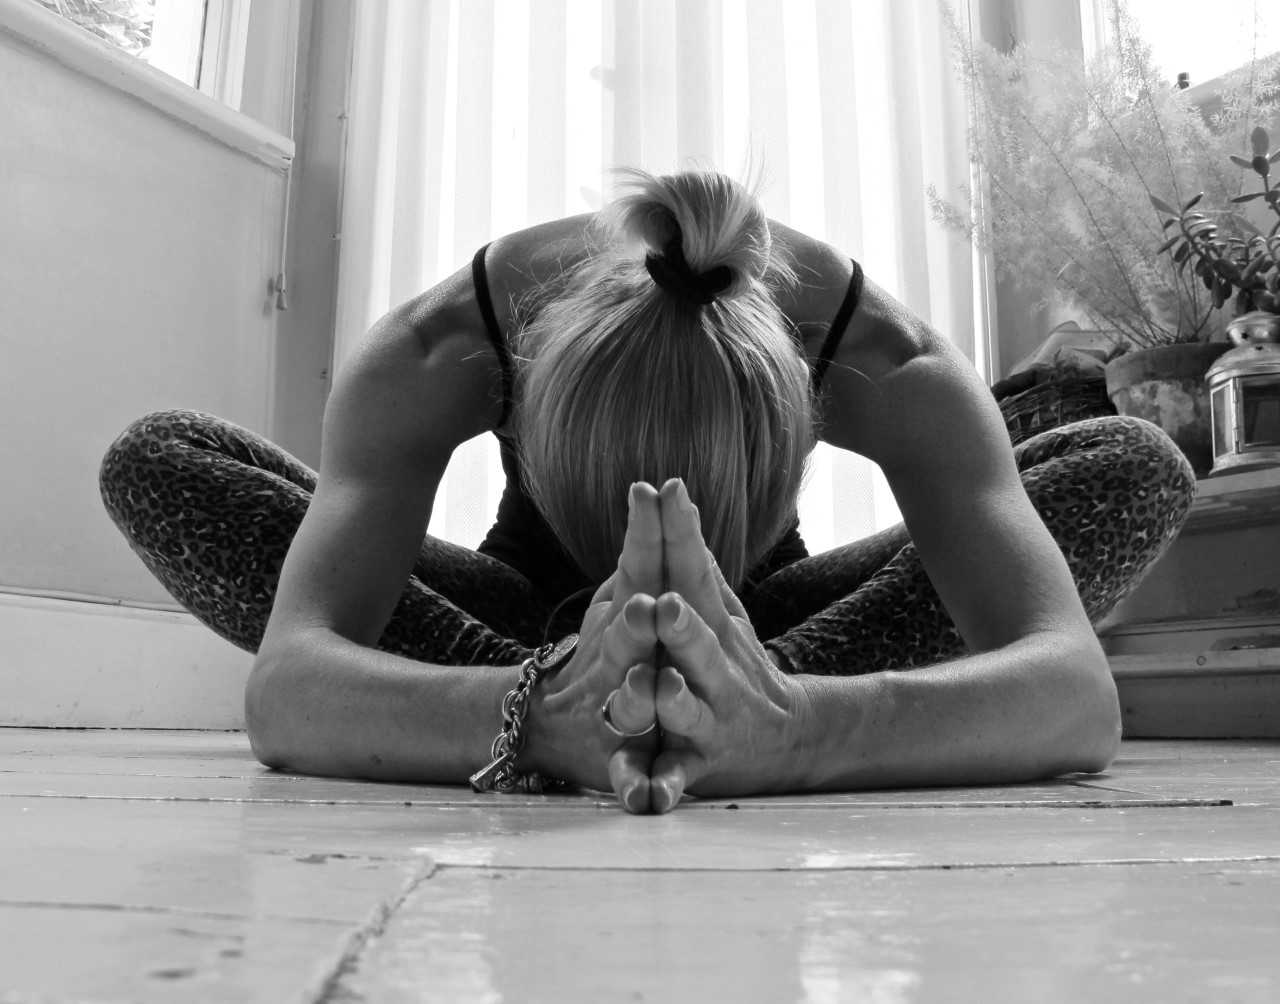 Two Tone Yoga